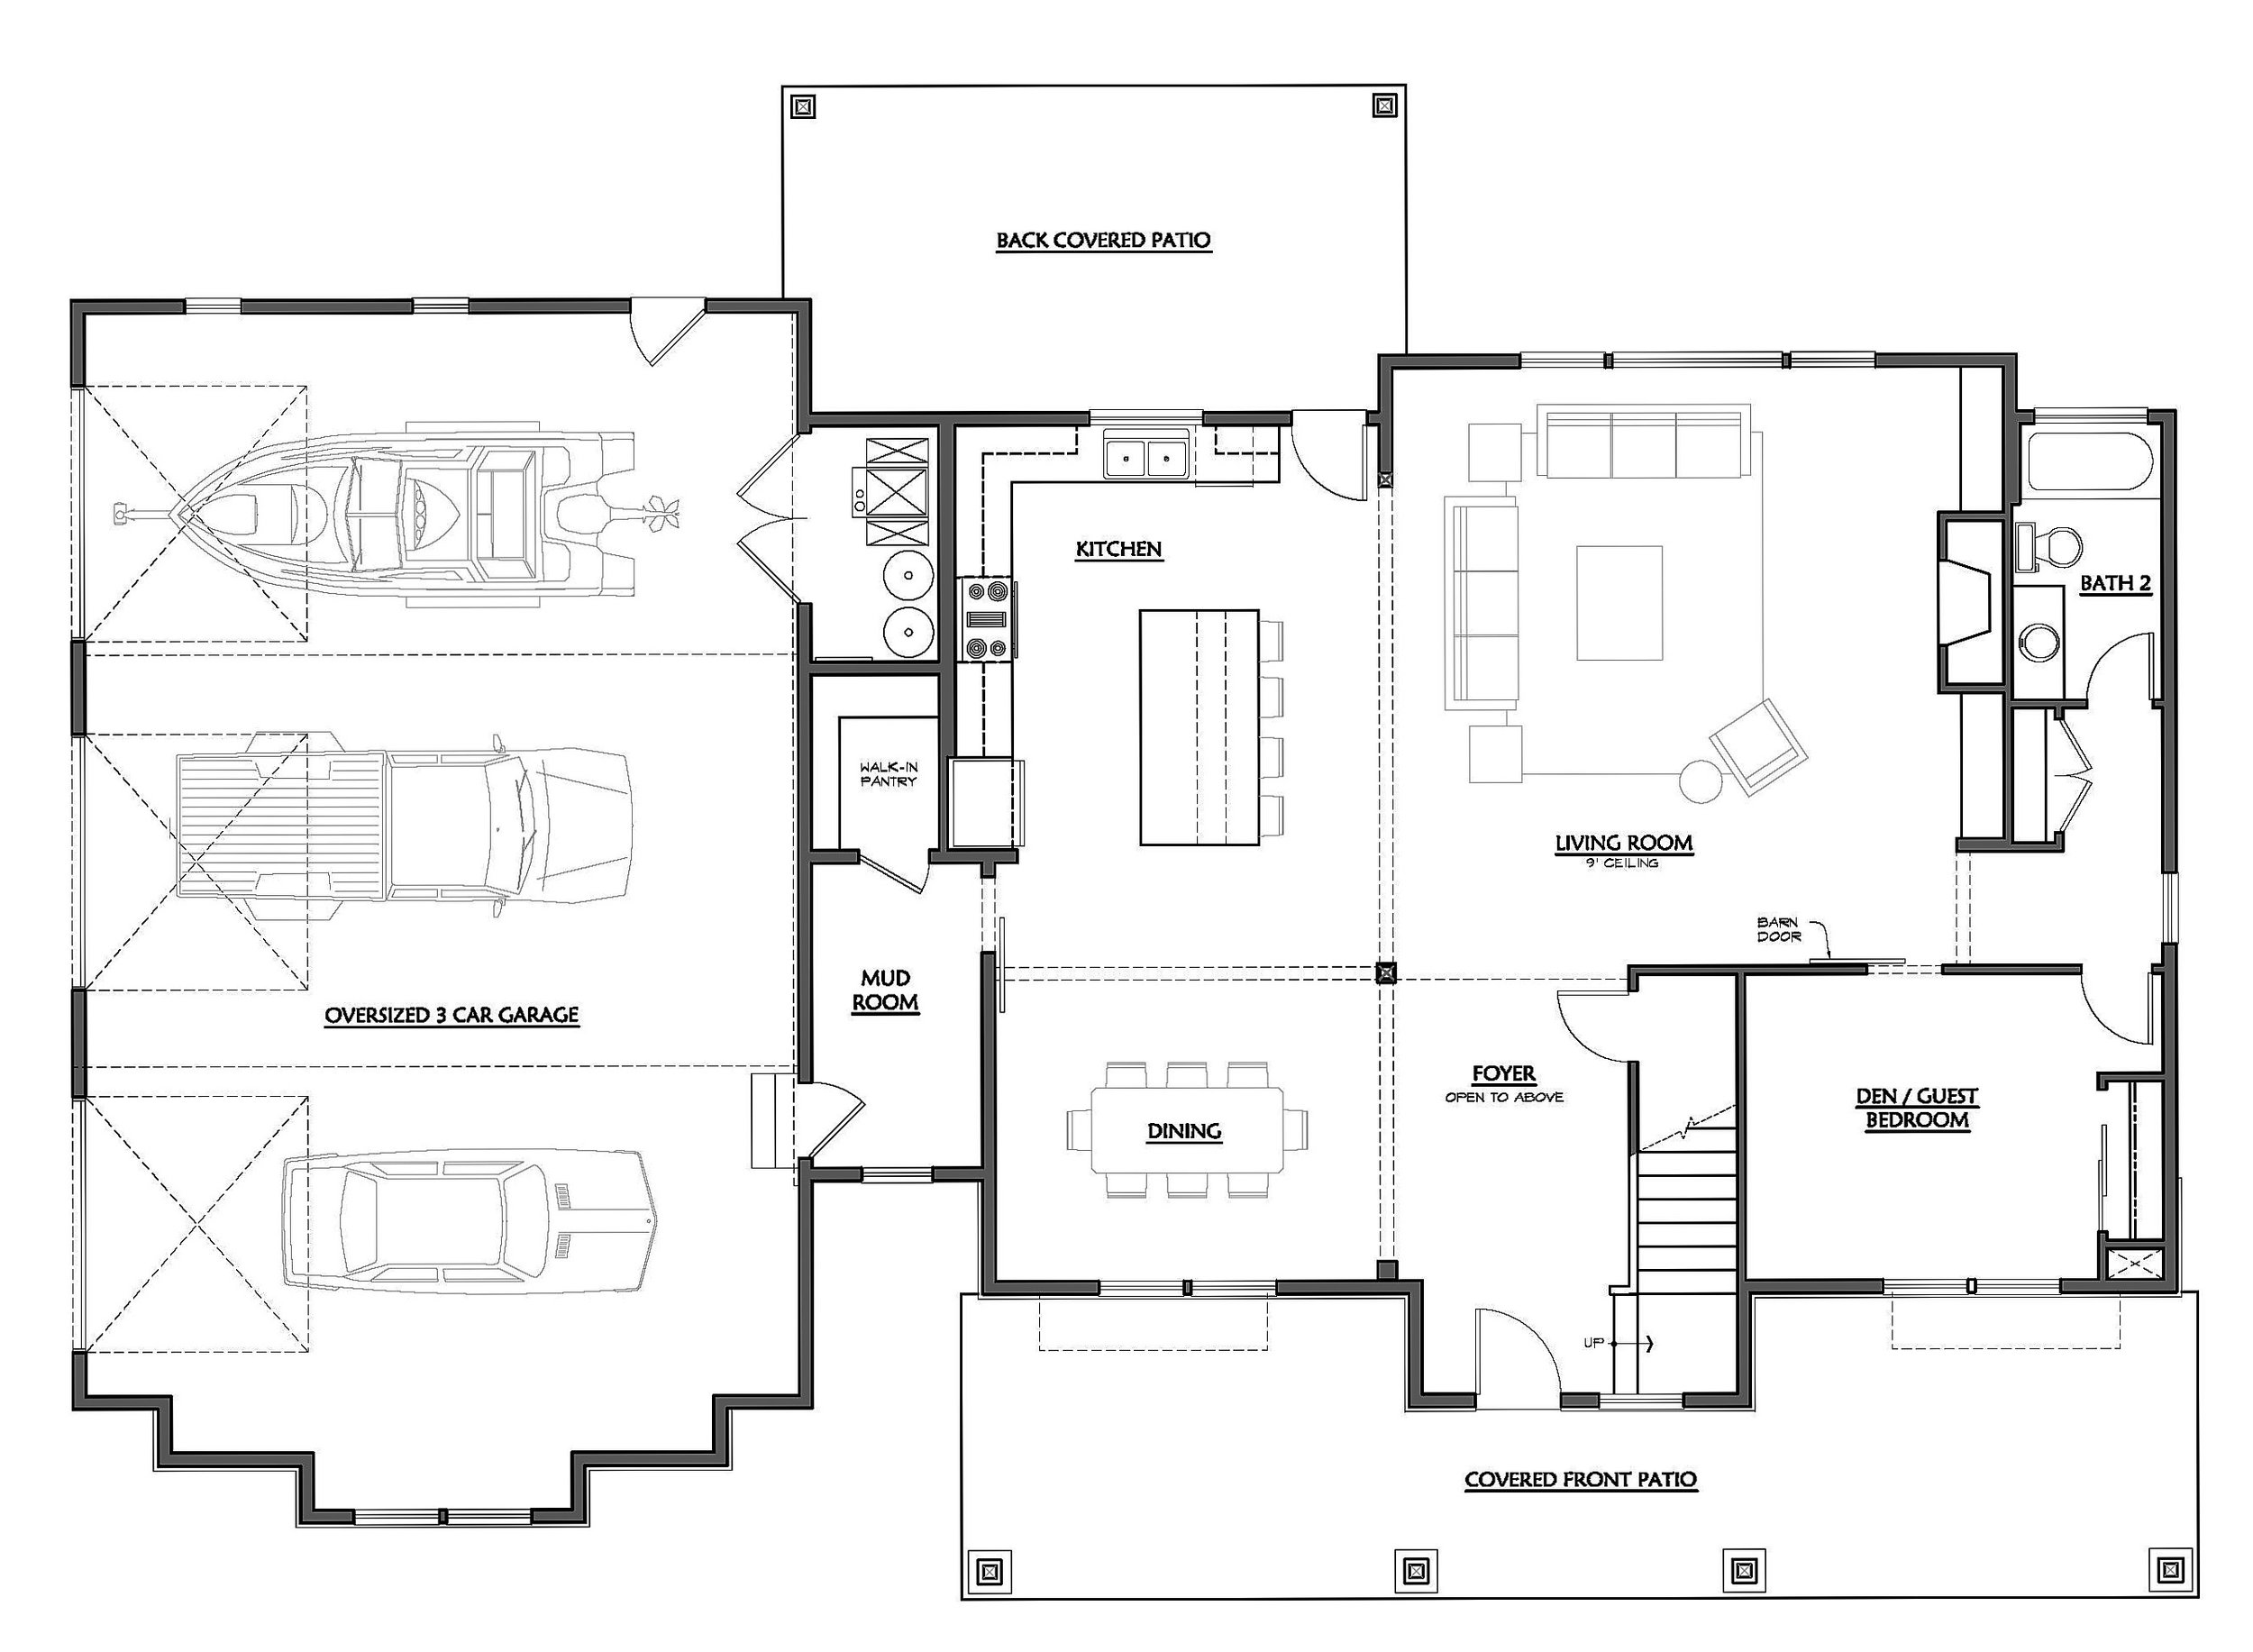 Marketing Floor Plans 1-19-17 Model (1).jpg